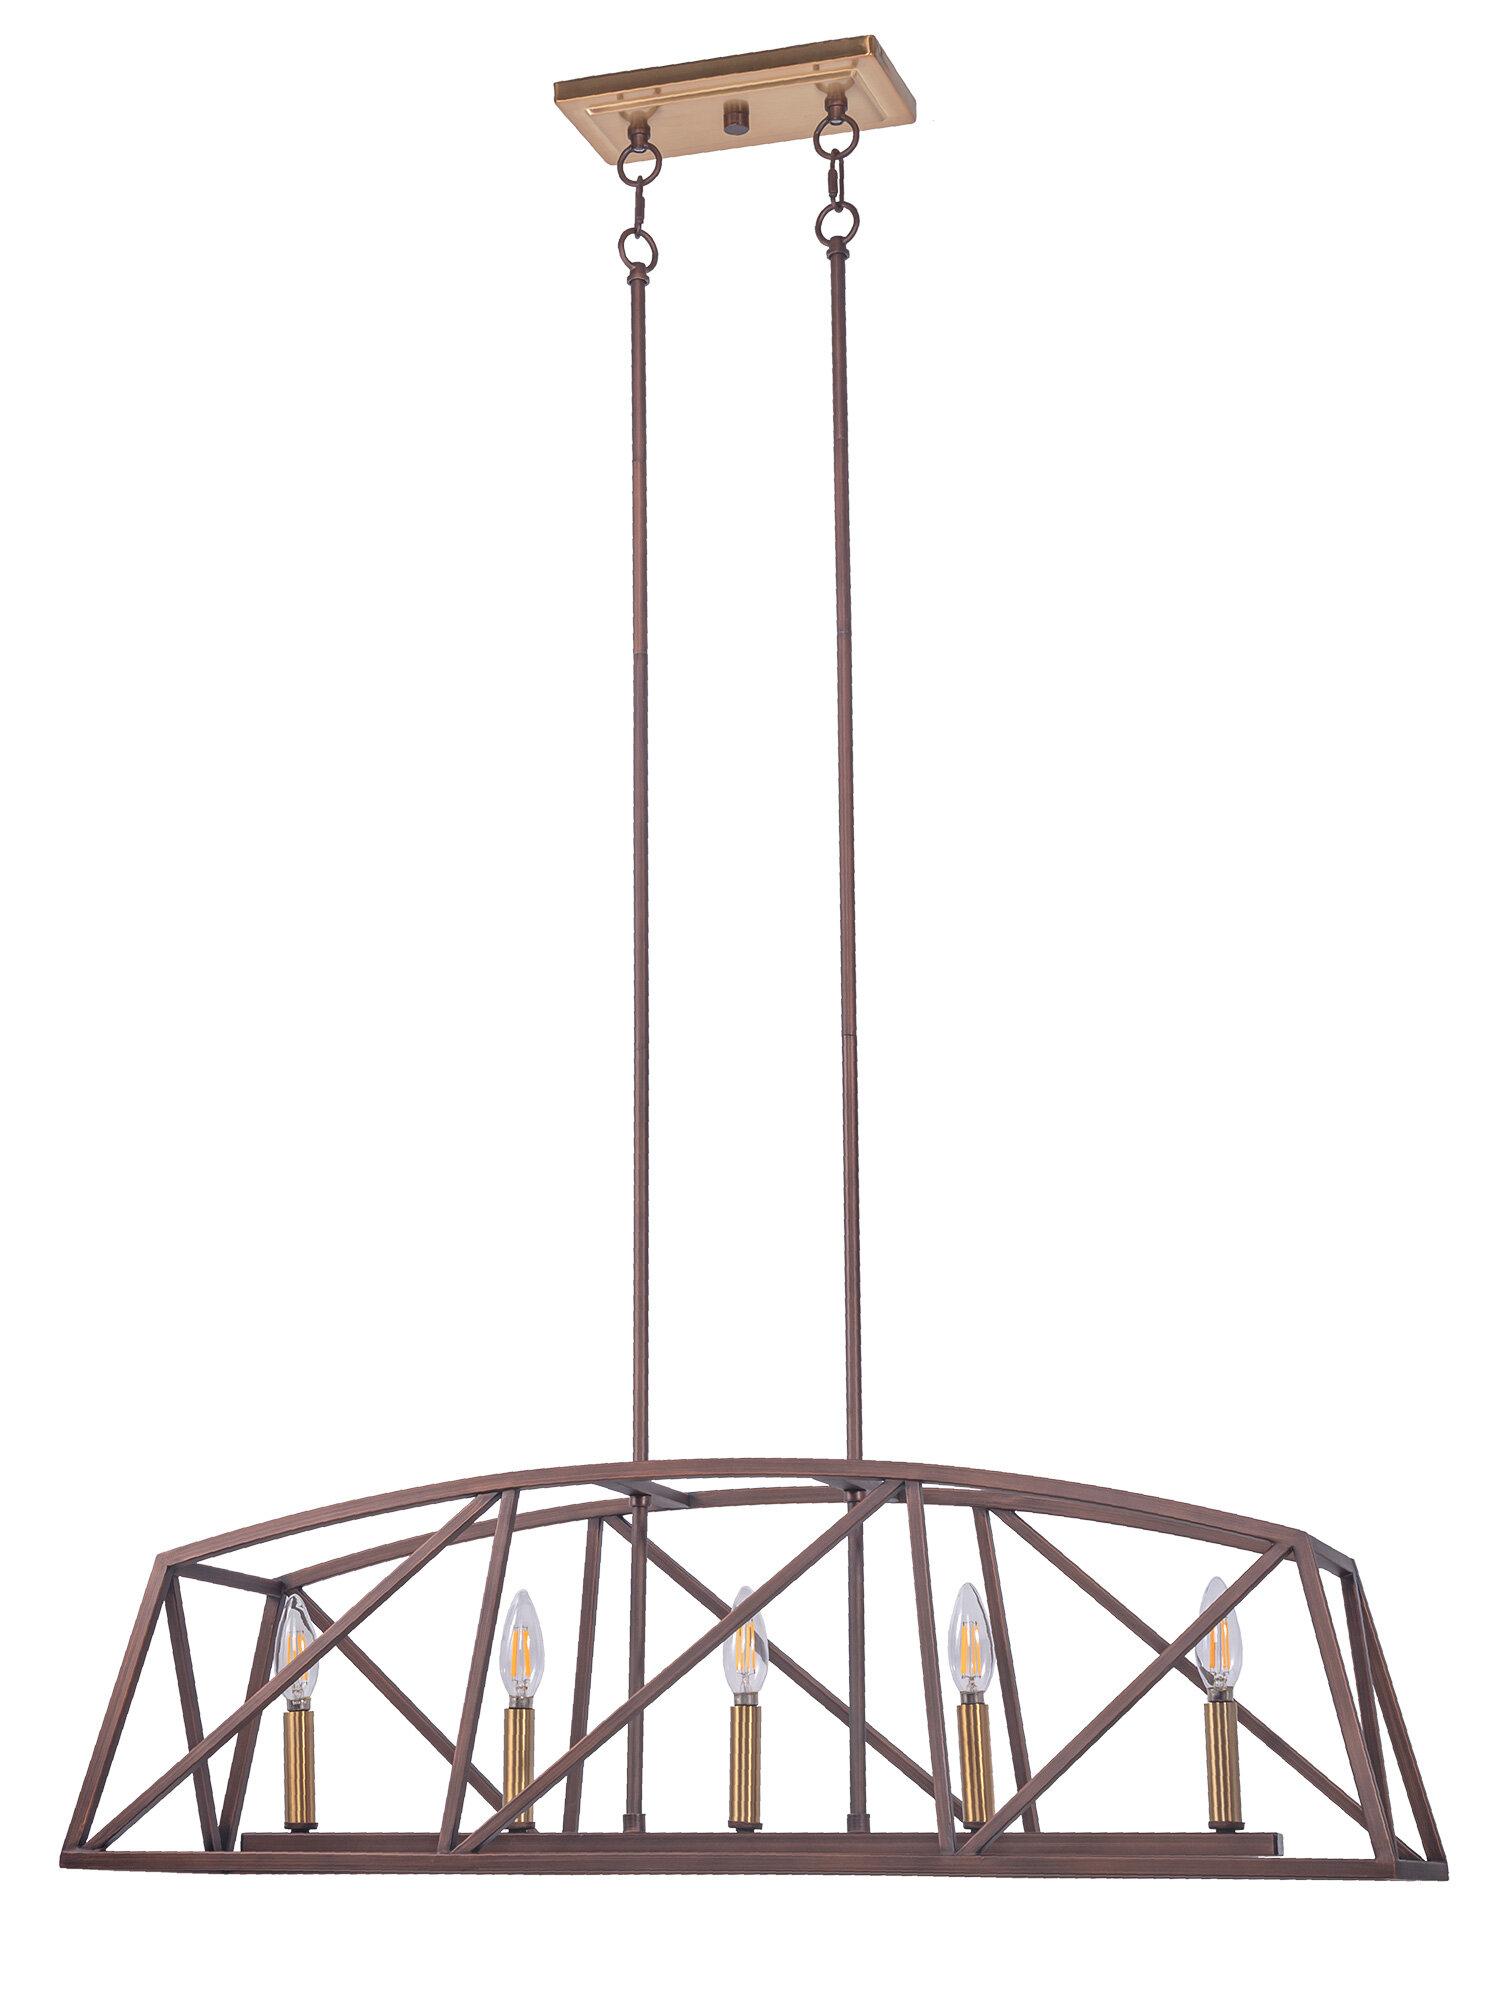 4 6 Light Wrought Iron Kitchen Island Lighting You Ll Love In 2021 Wayfair